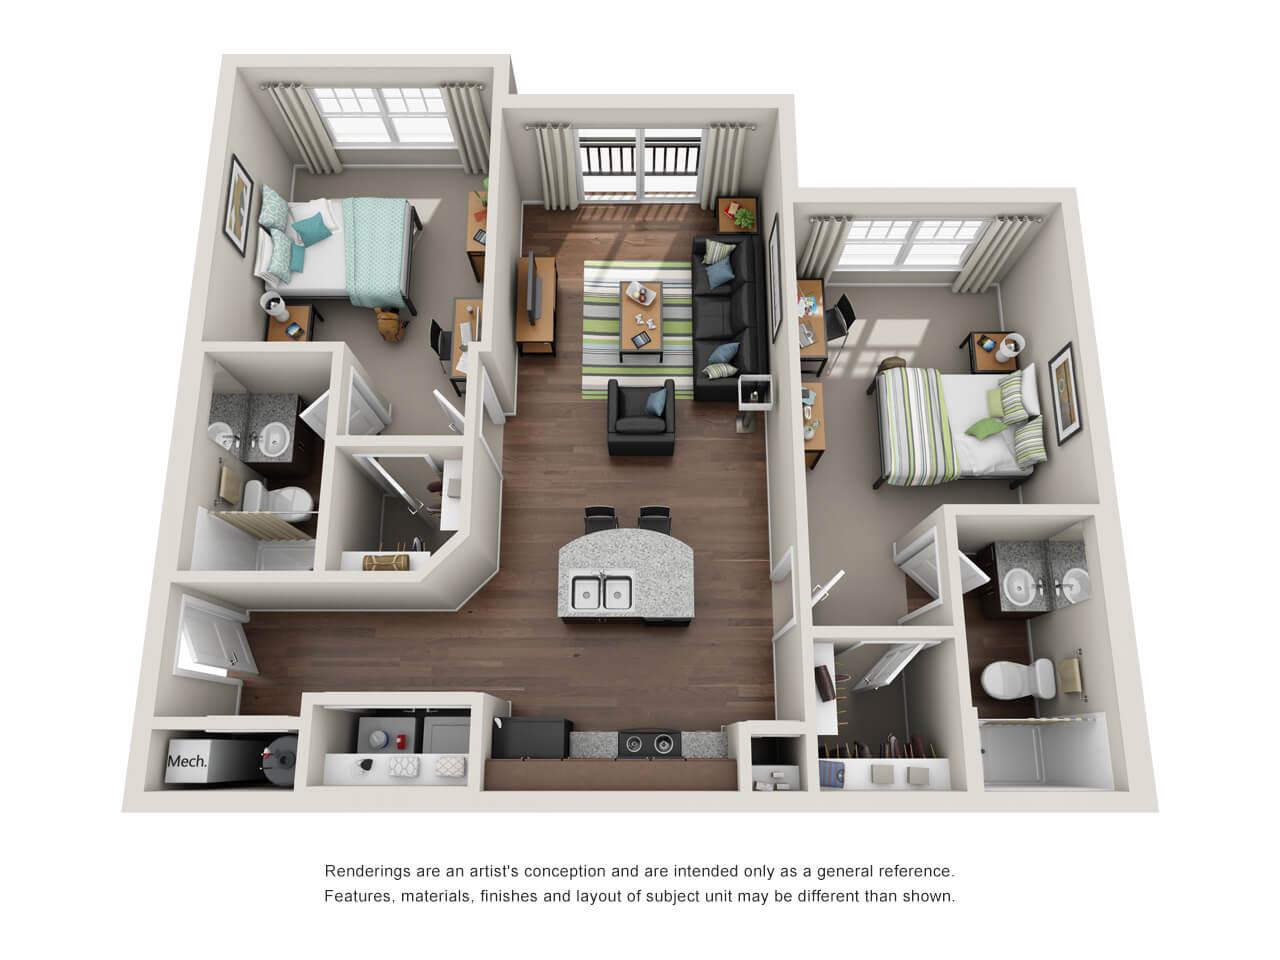 apartment website design 2017 - get inspired!